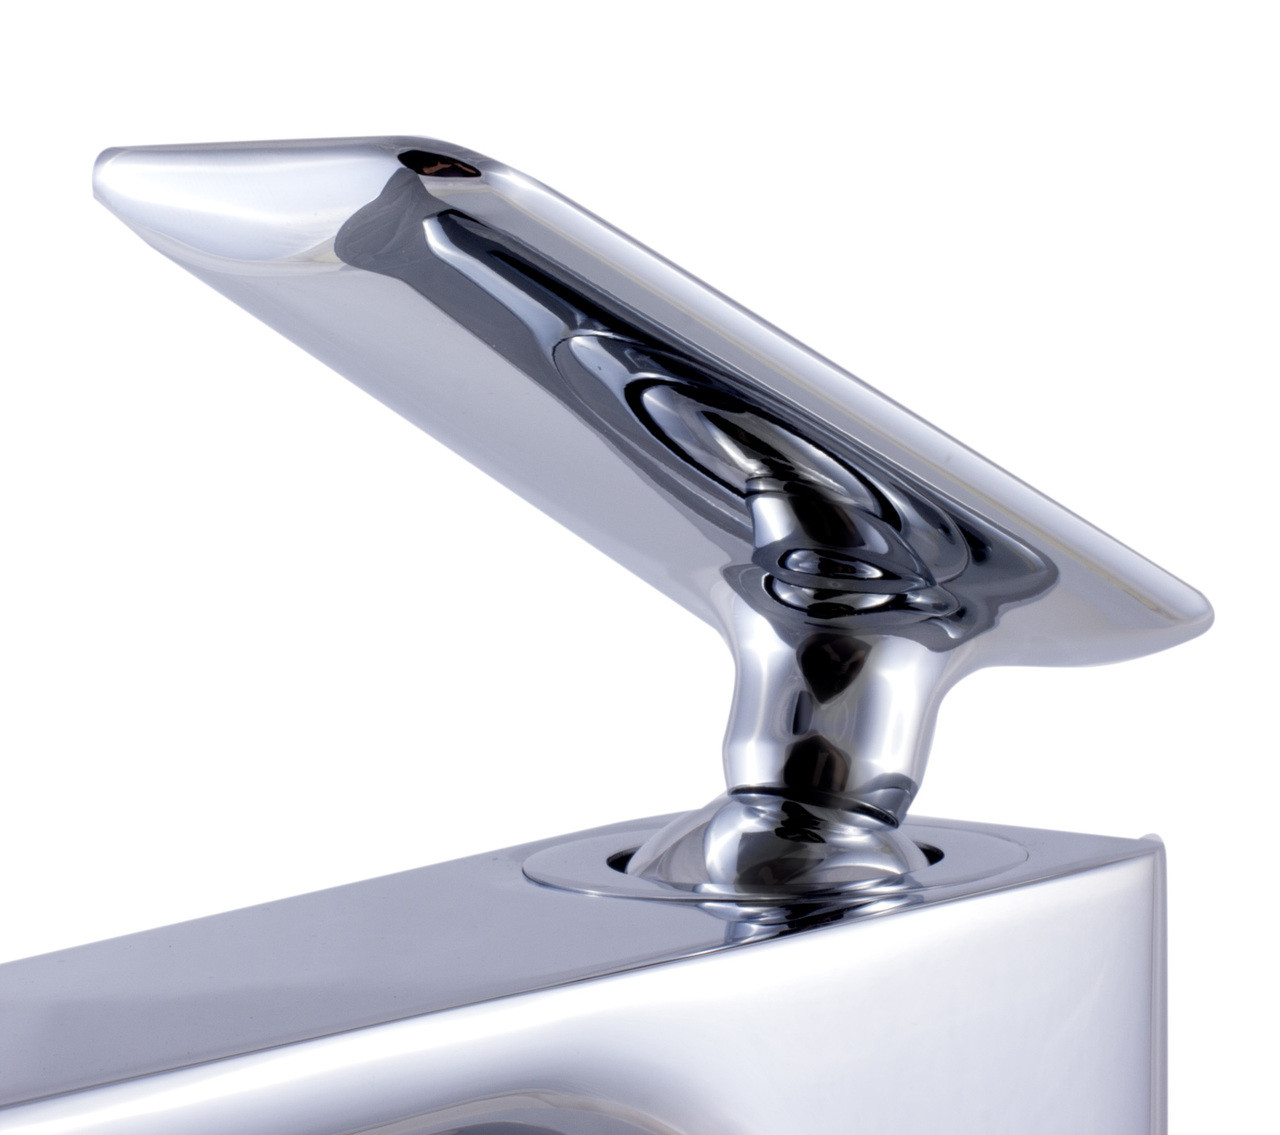 ALFI brand AB1778-PC Polished Chrome Tall Single Hole Modern Bathroom Faucet